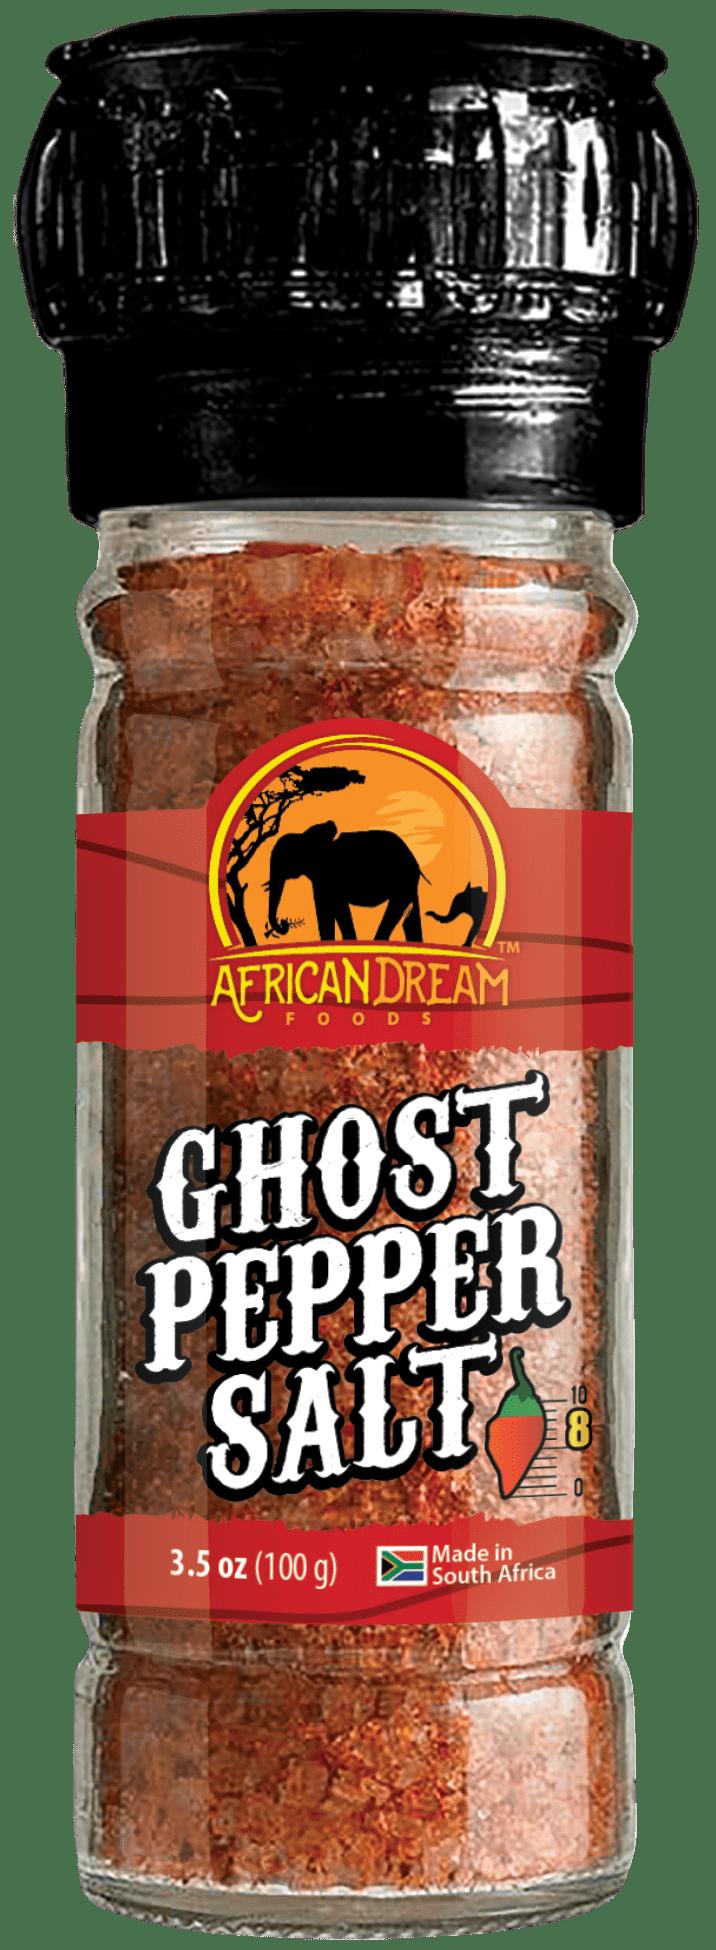 20-004 GHOST PEPPER SALT- FRONT MOCK UP SINGLE-min